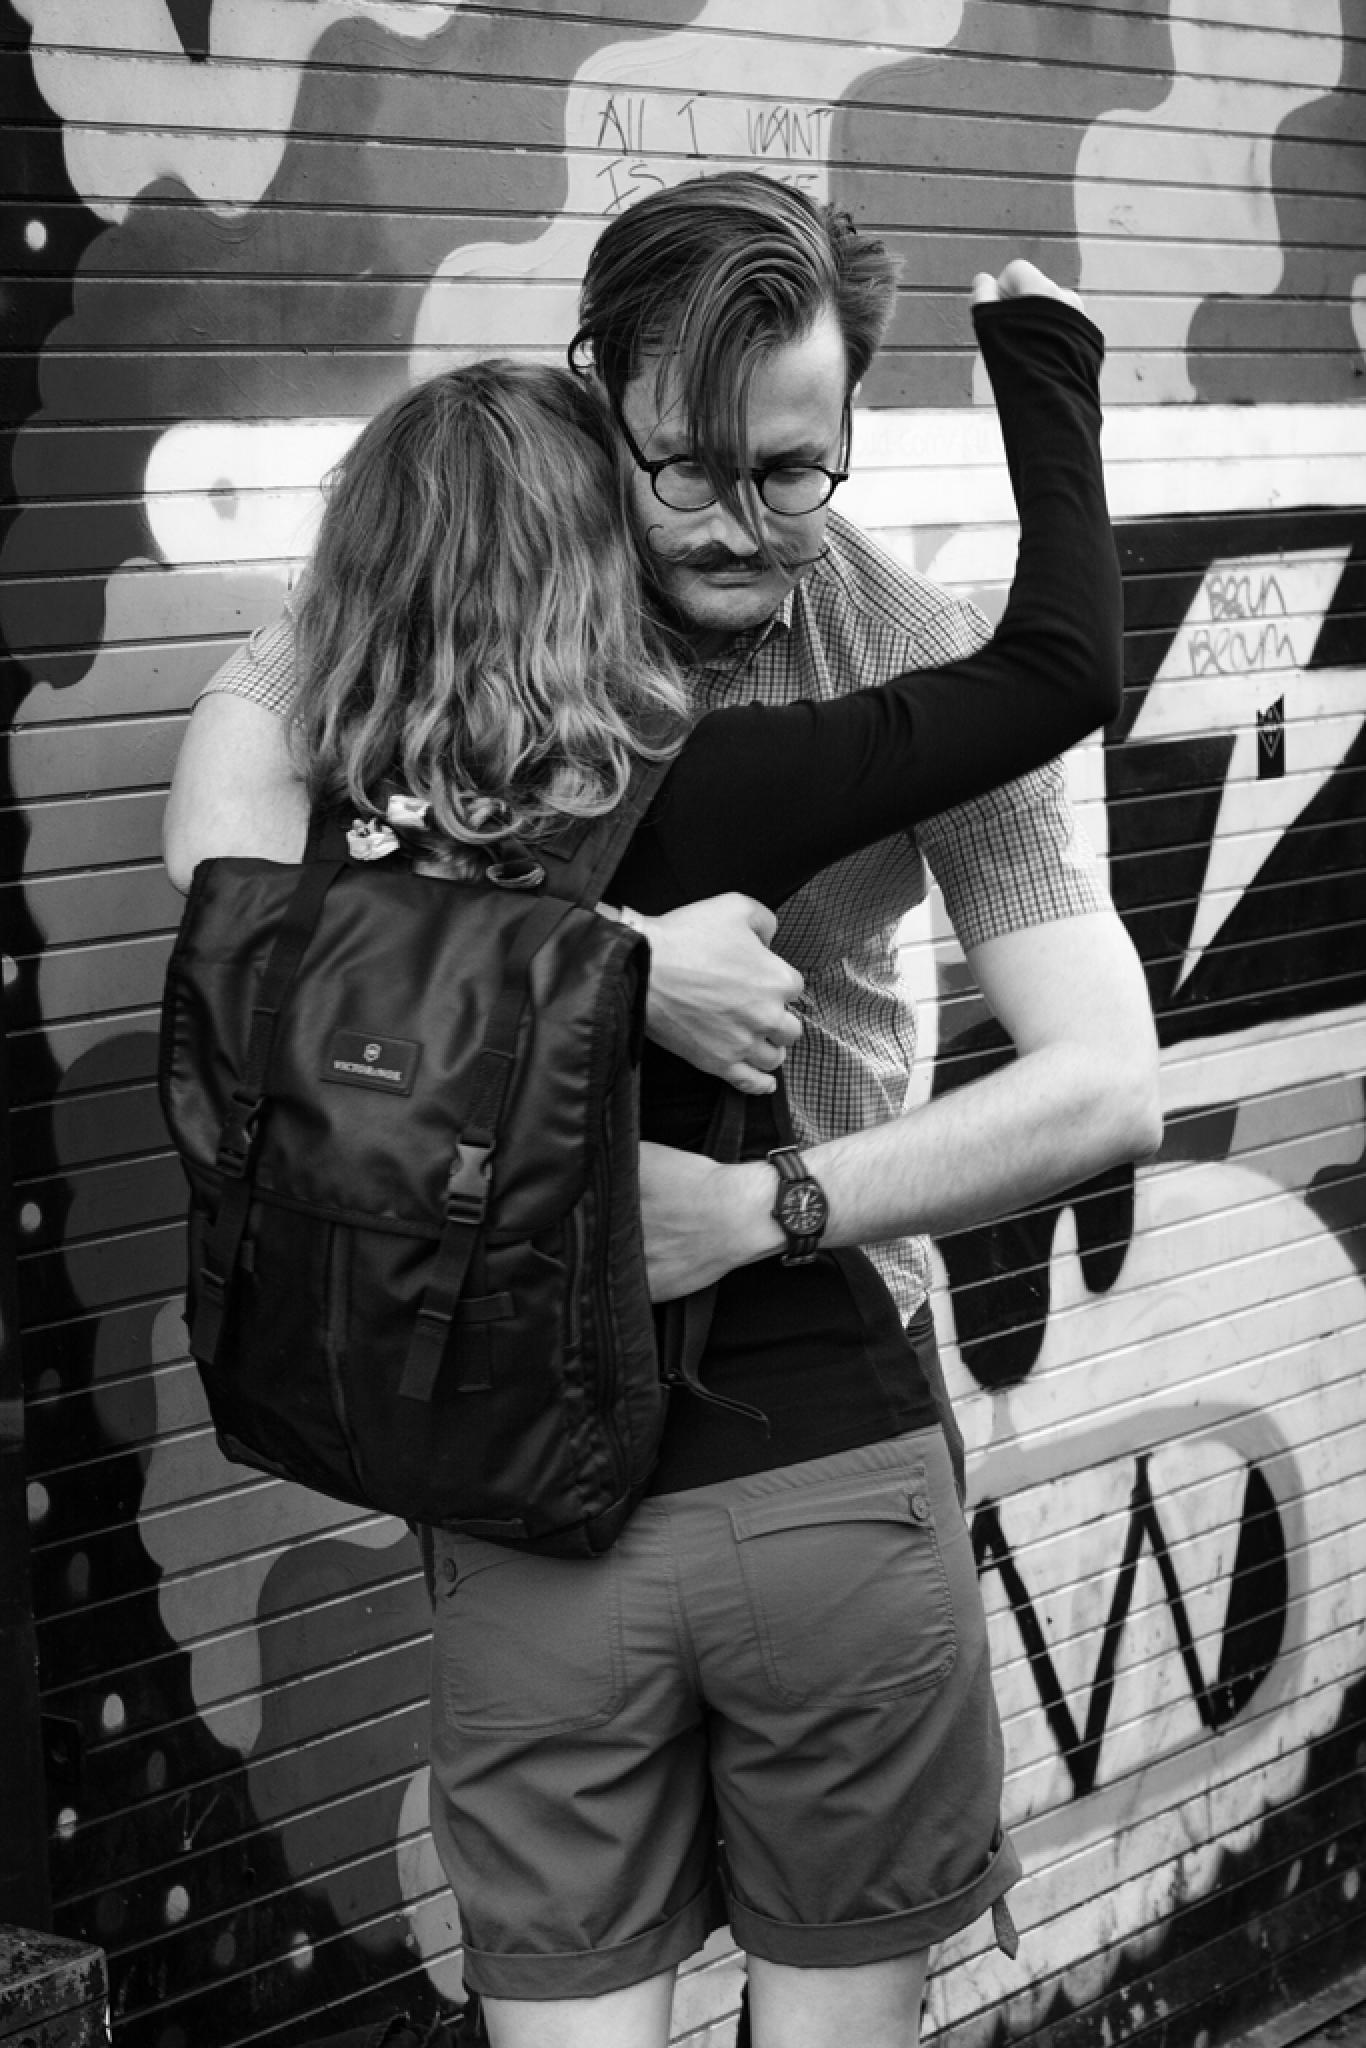 A little bit of love by ionut.cirja